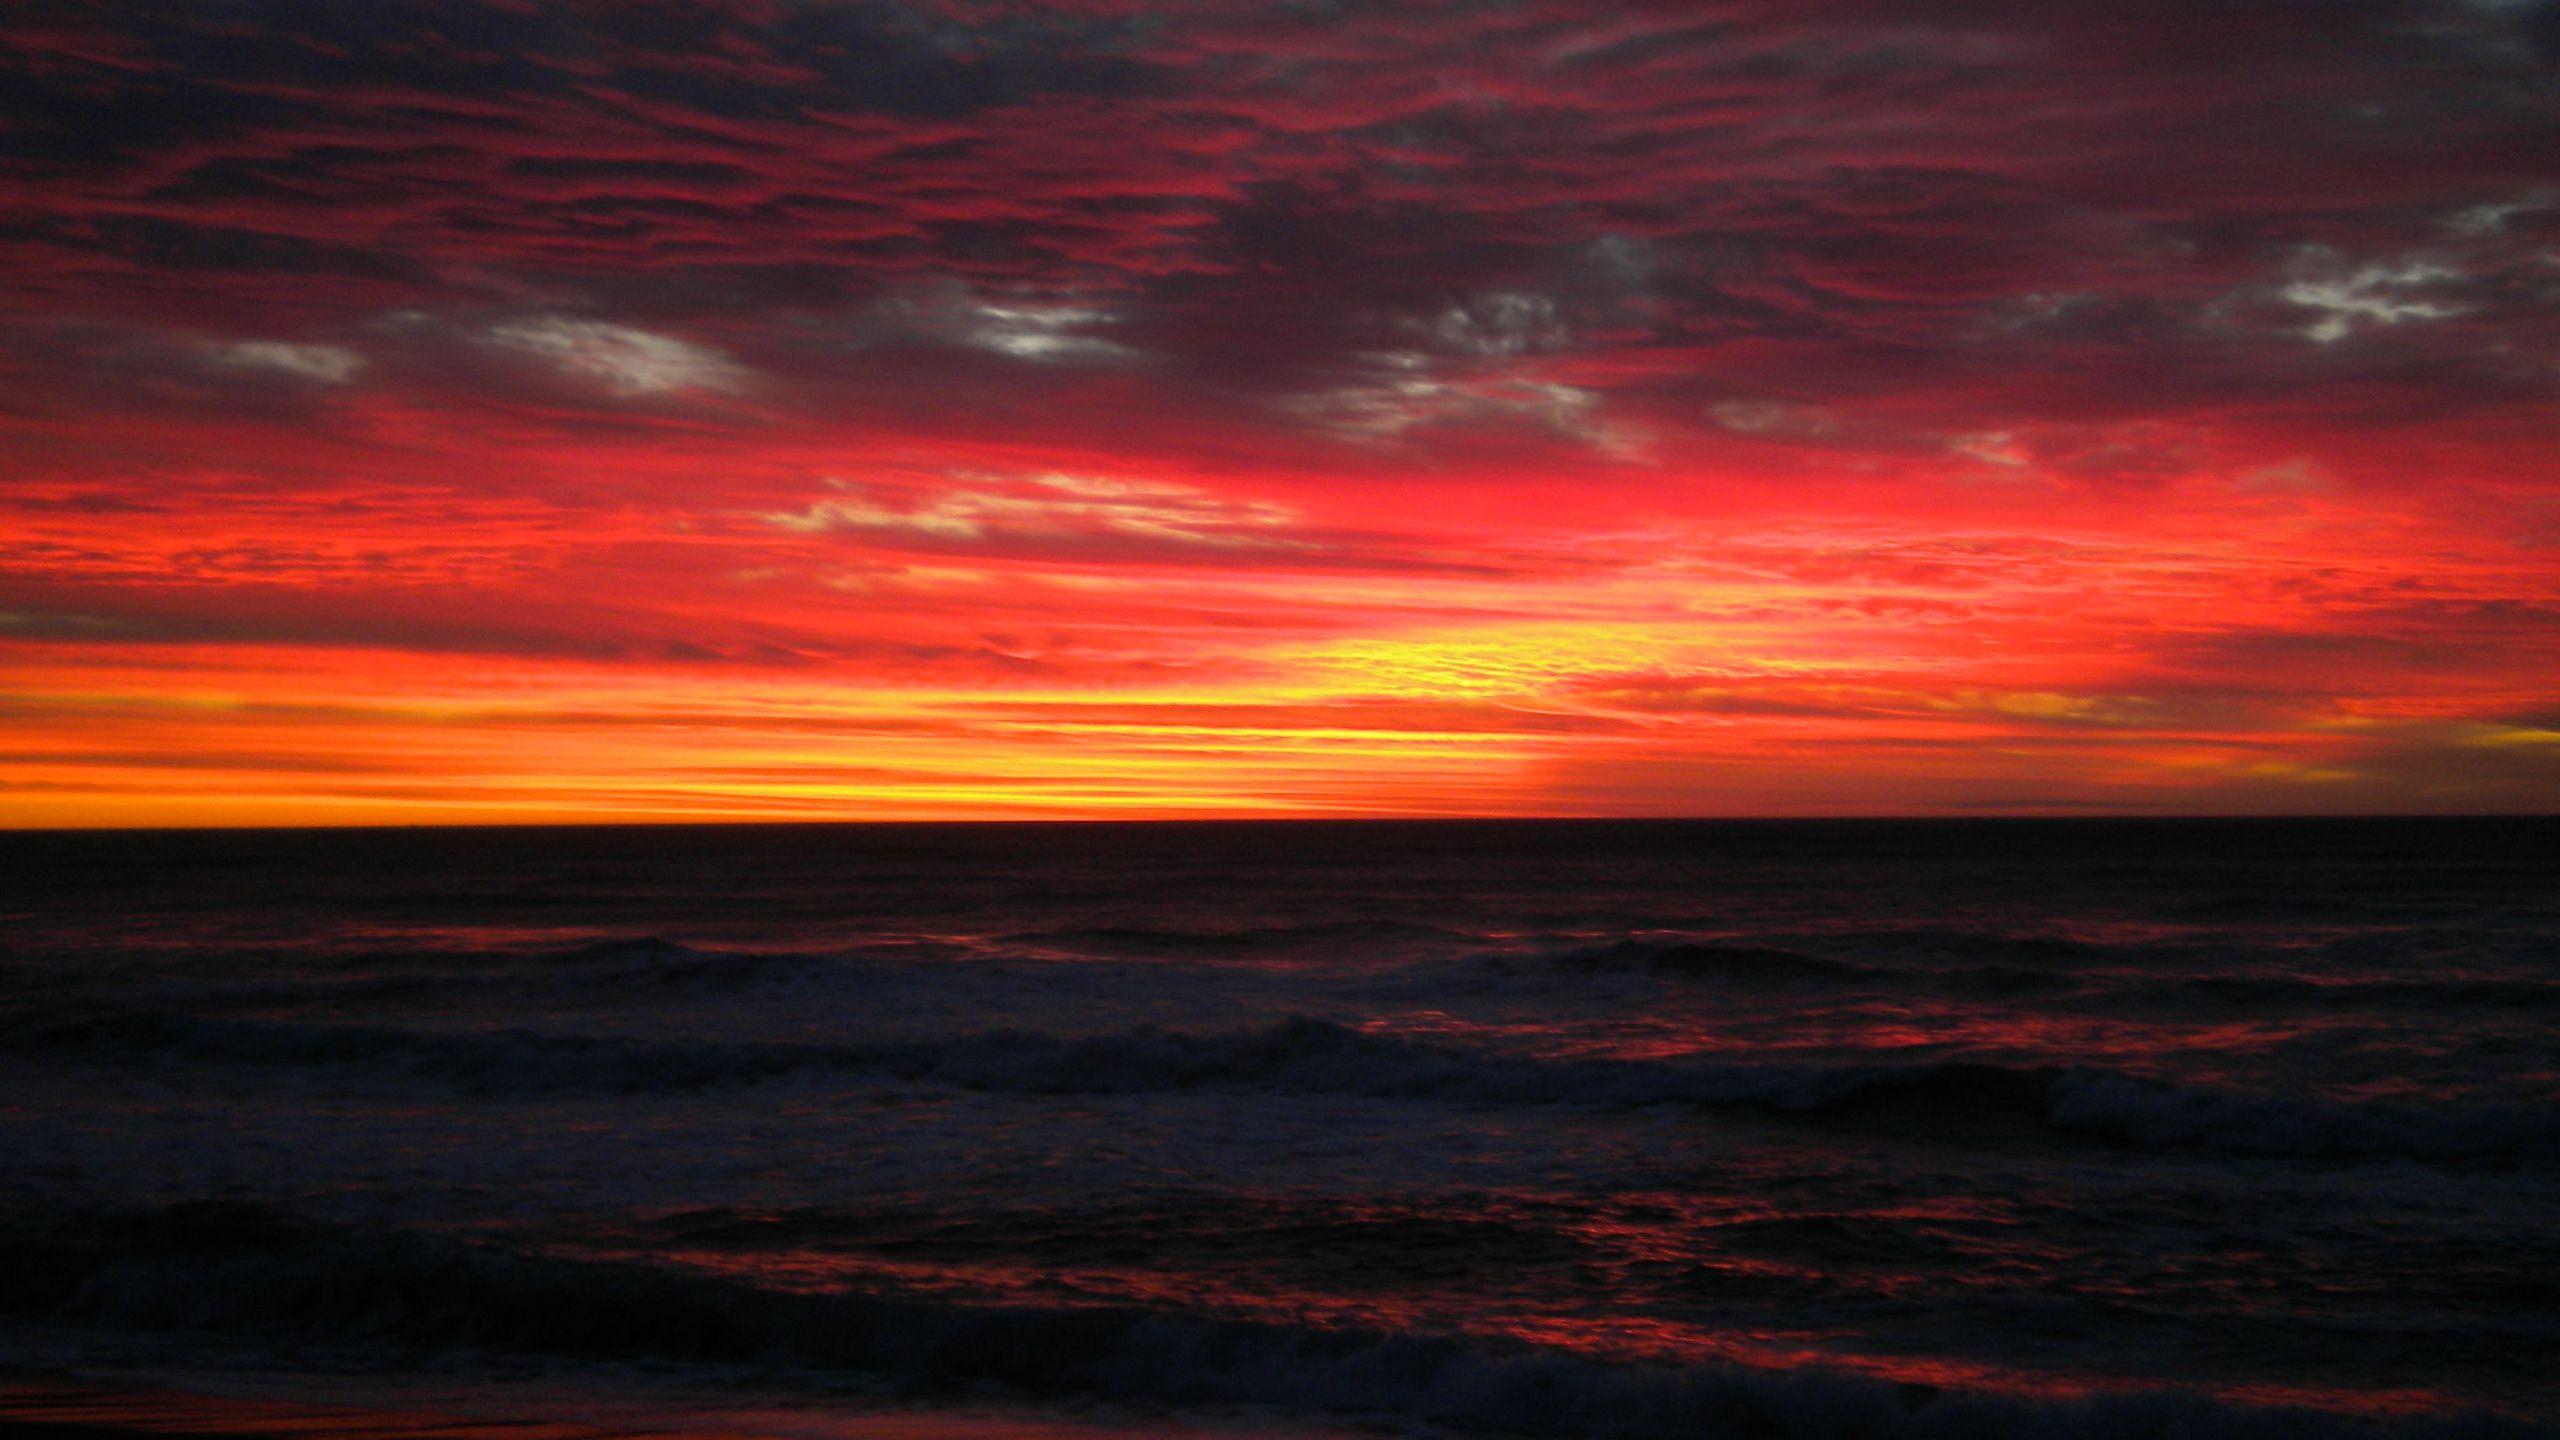 BOTPOST] Sunset over Punakaiki New Zealand No effects no filters 2560x1440